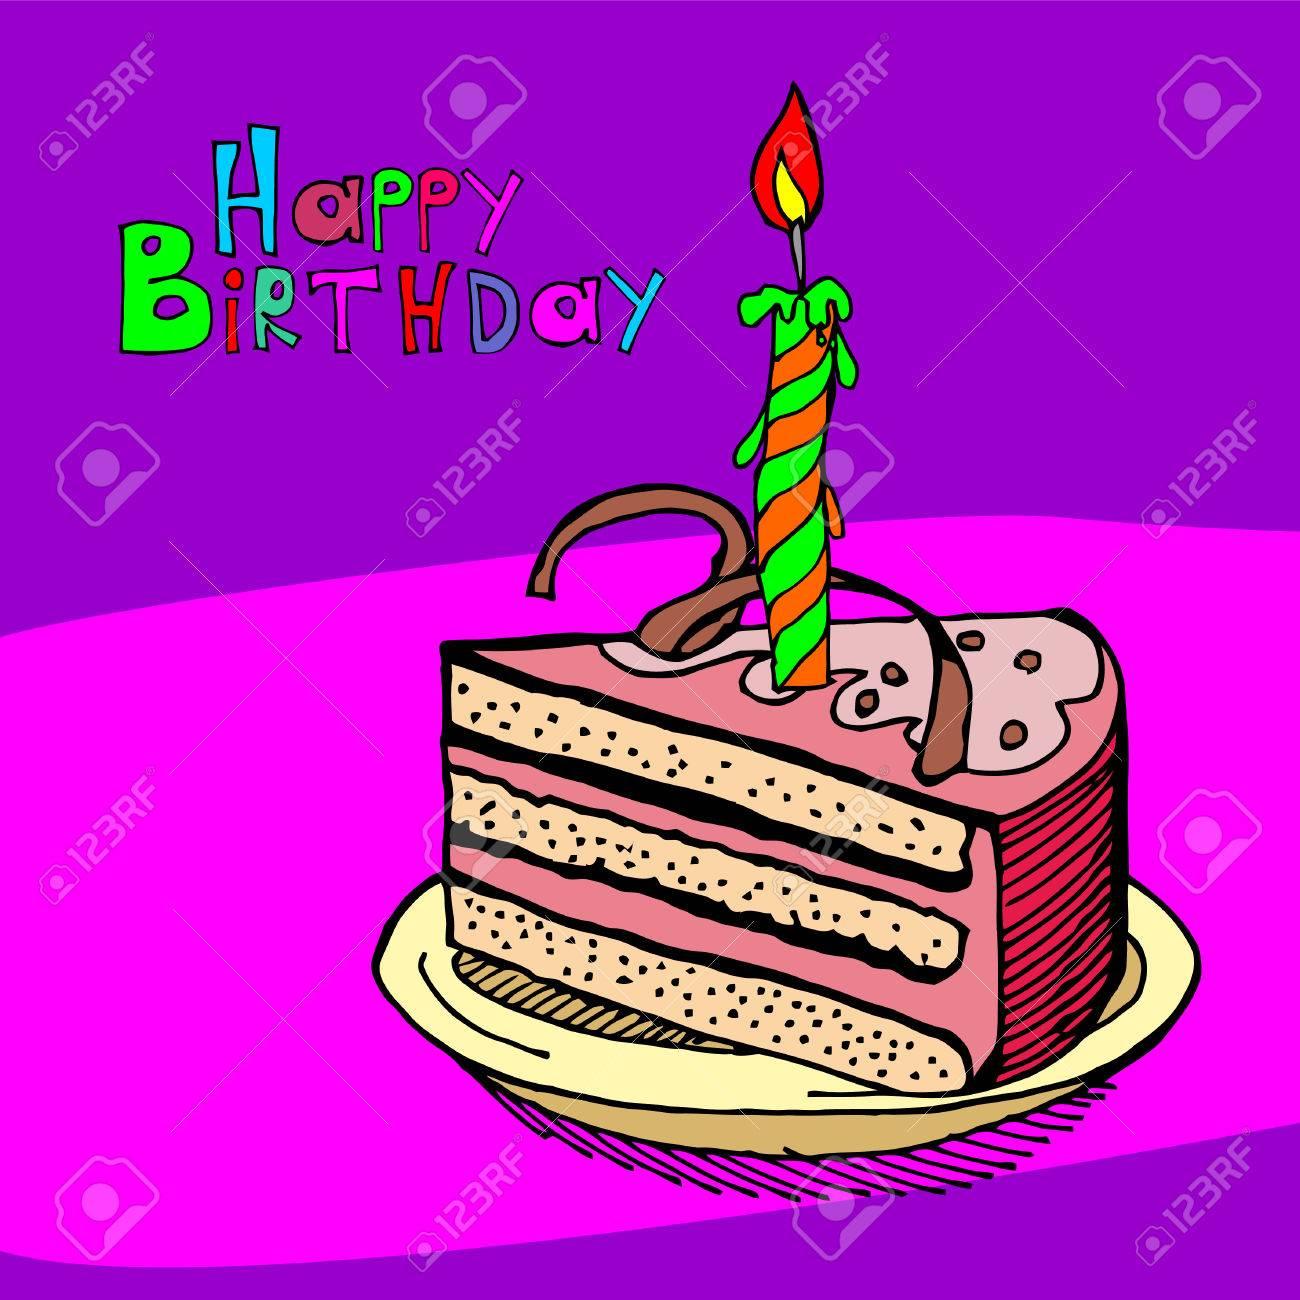 Cartoon Cake Birthday Card Candle Royalty Free Cliparts Vectors